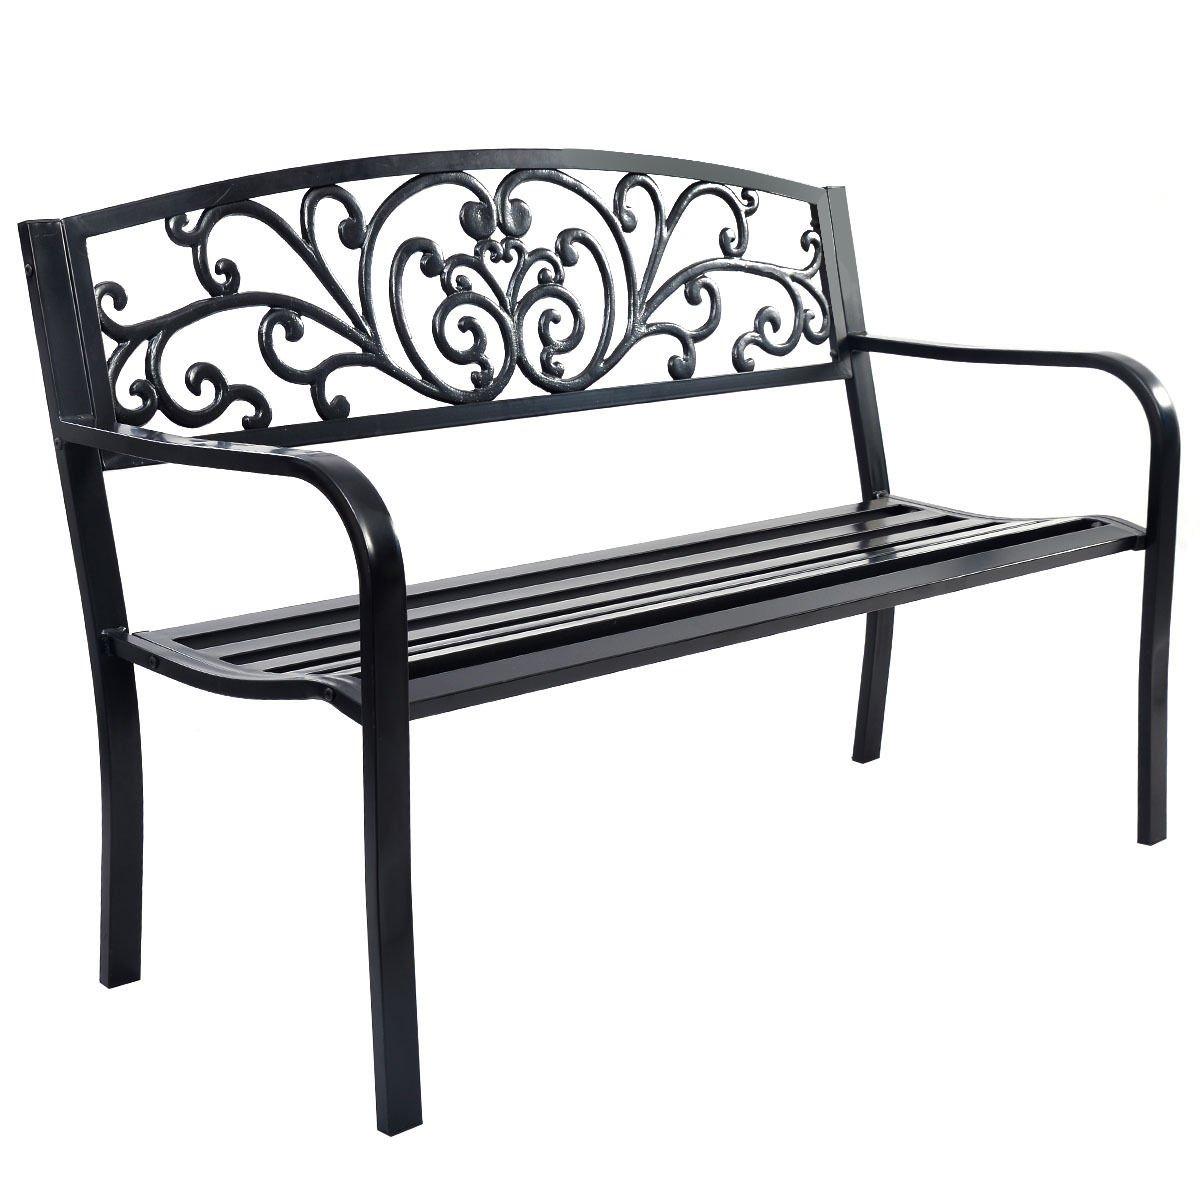 Long 50'' Patio Park Garden Bench Porch Chair Steel Frame Cast Iron Backrest